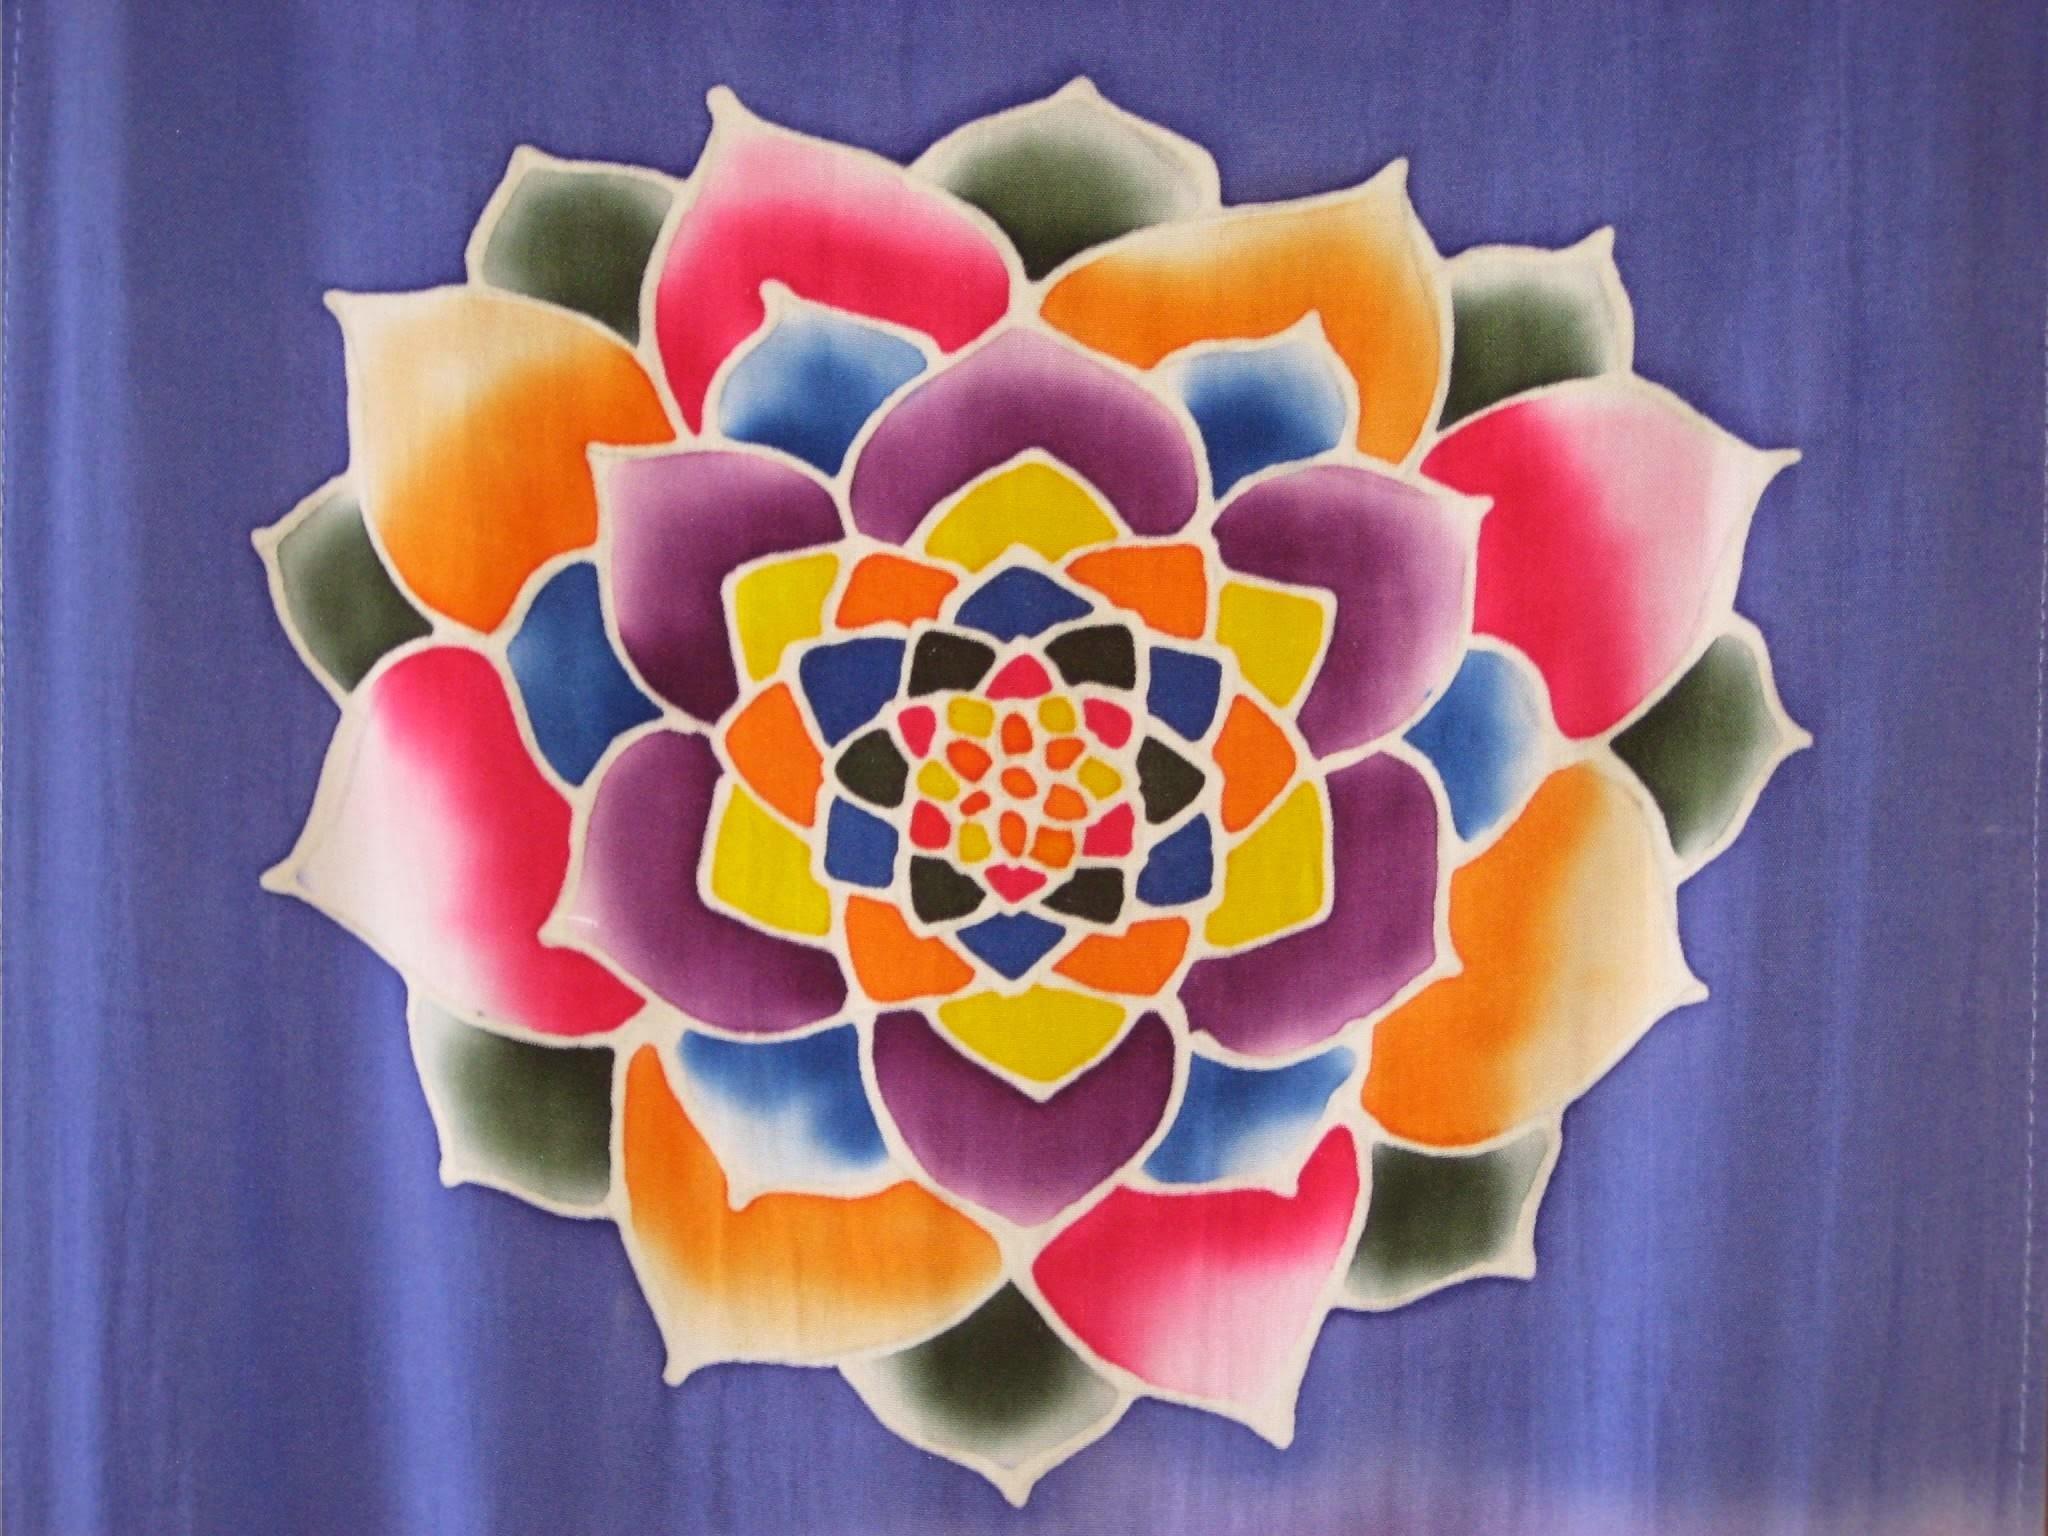 Yandara+Yoga+TTC+1.14.2011+103